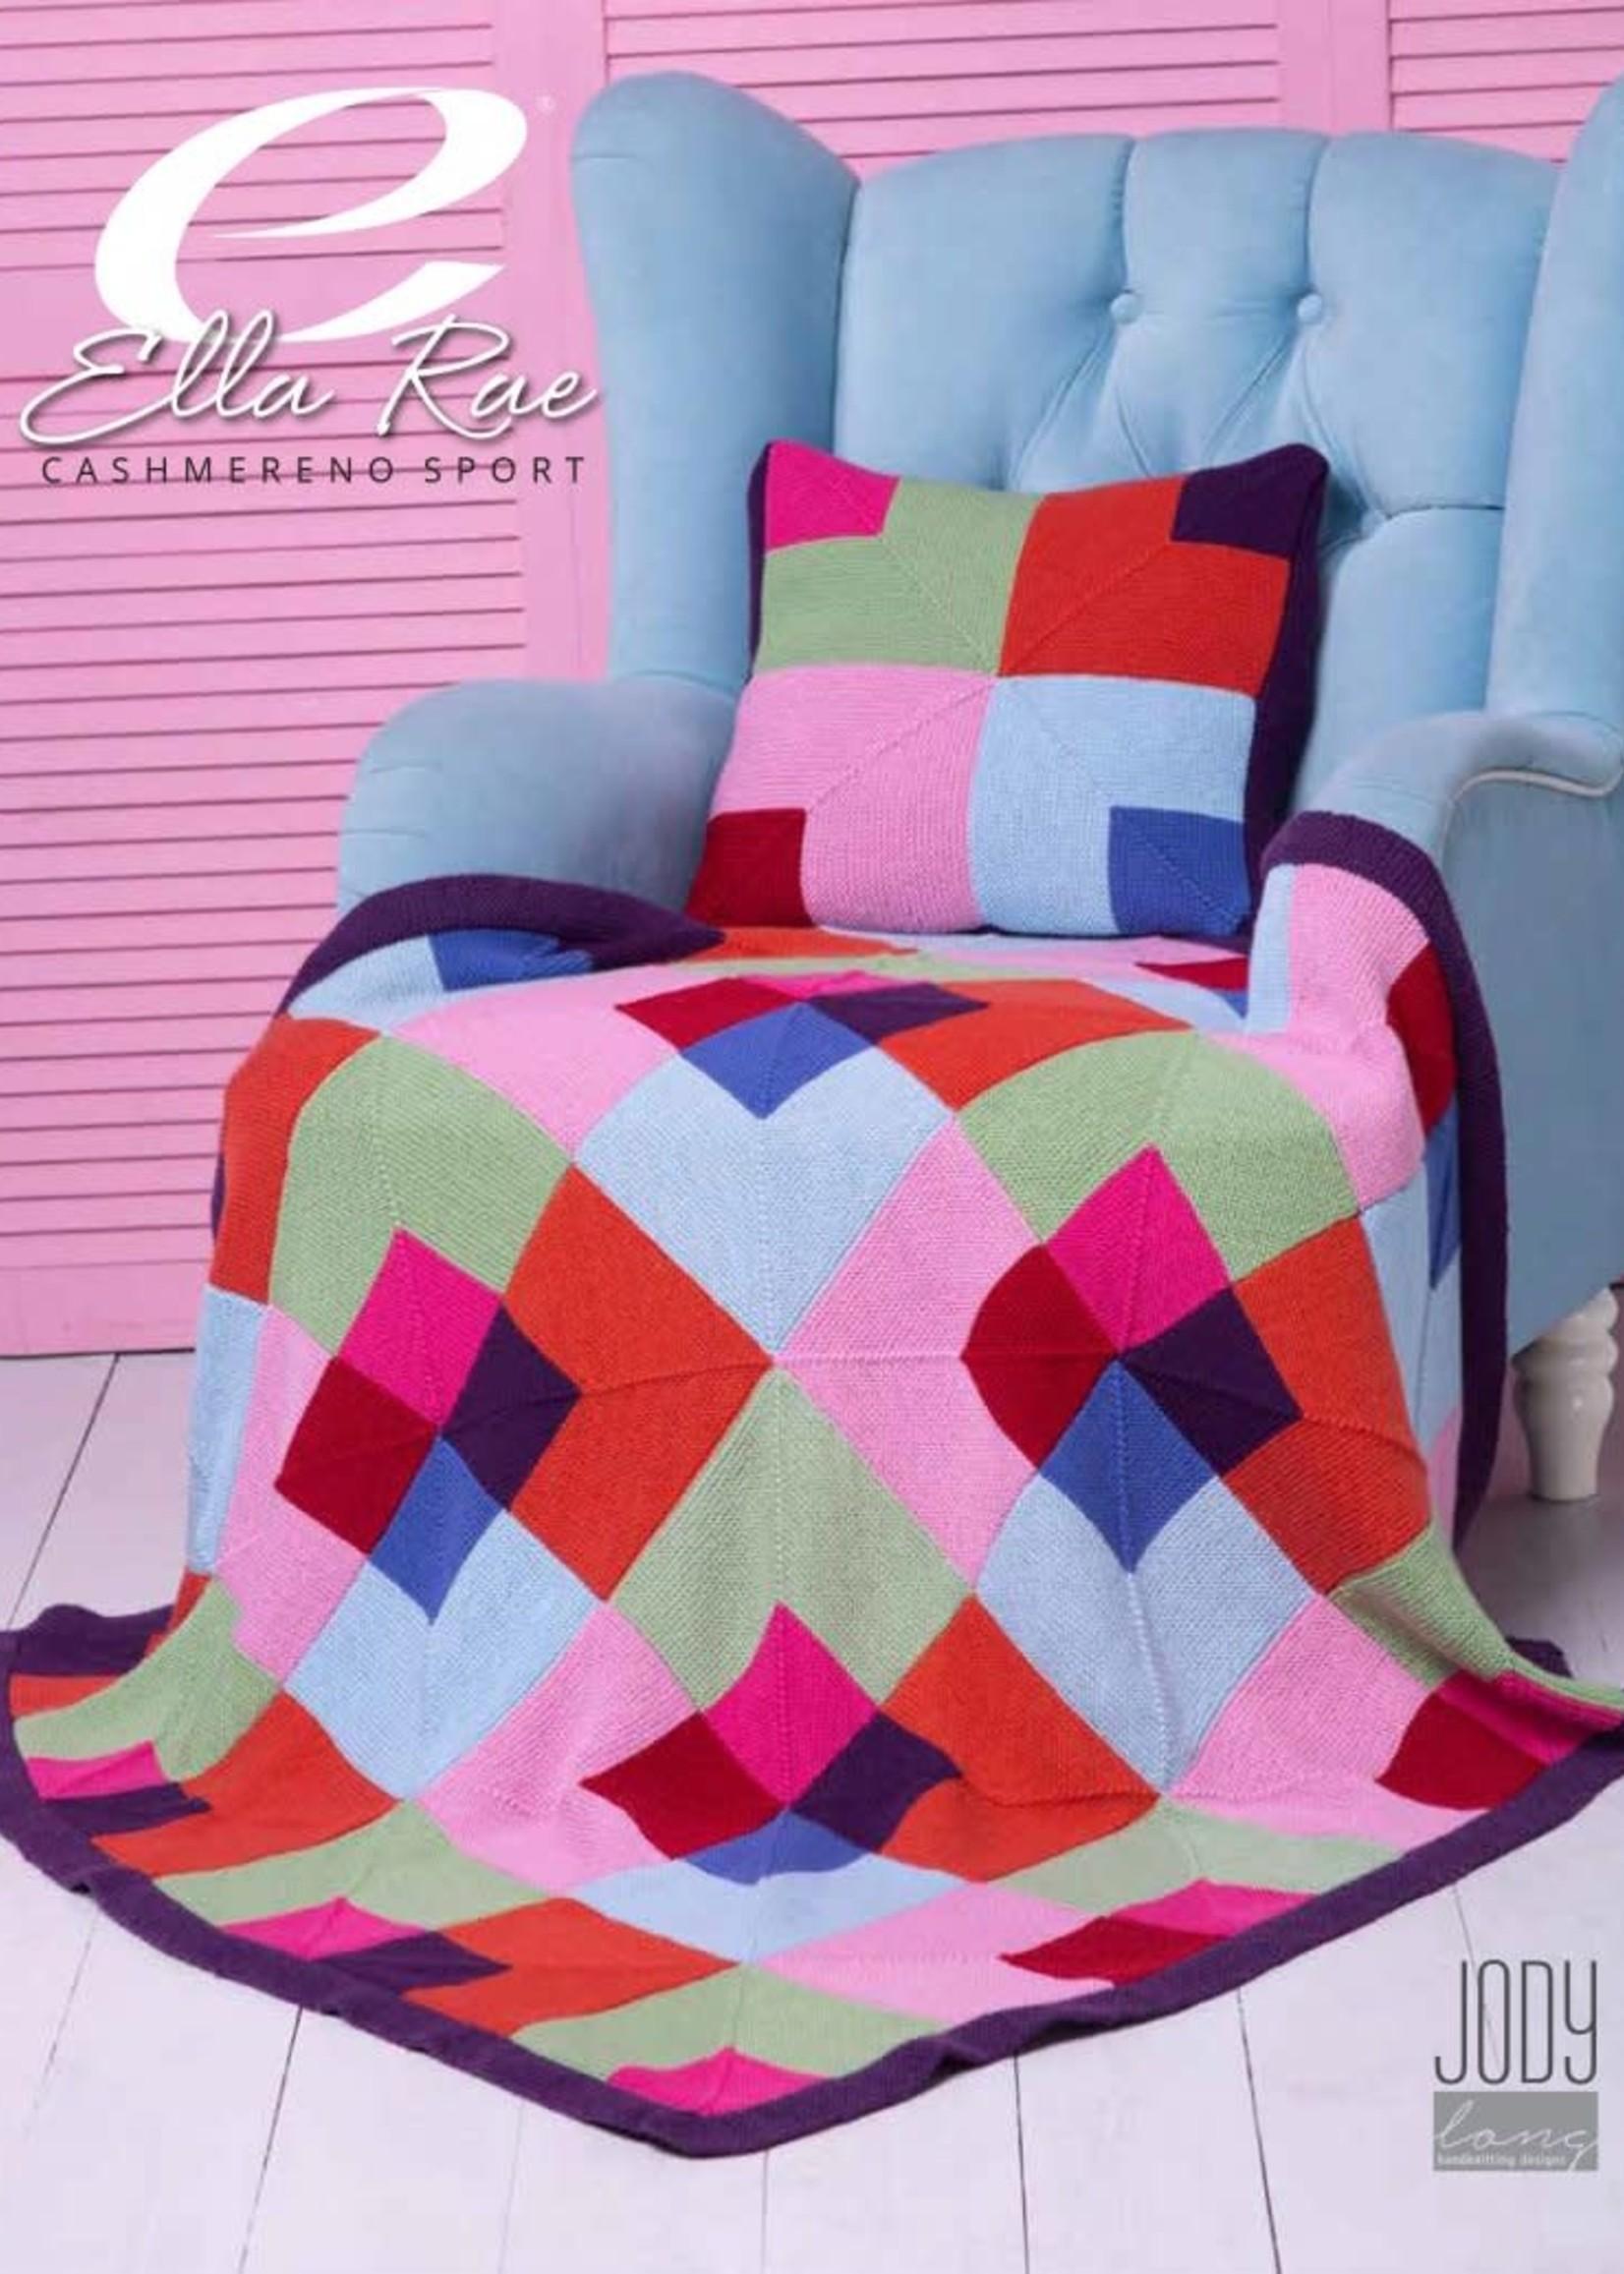 Ella Rae Ella Rae Pattern Stained Glass Blanket and Cushion